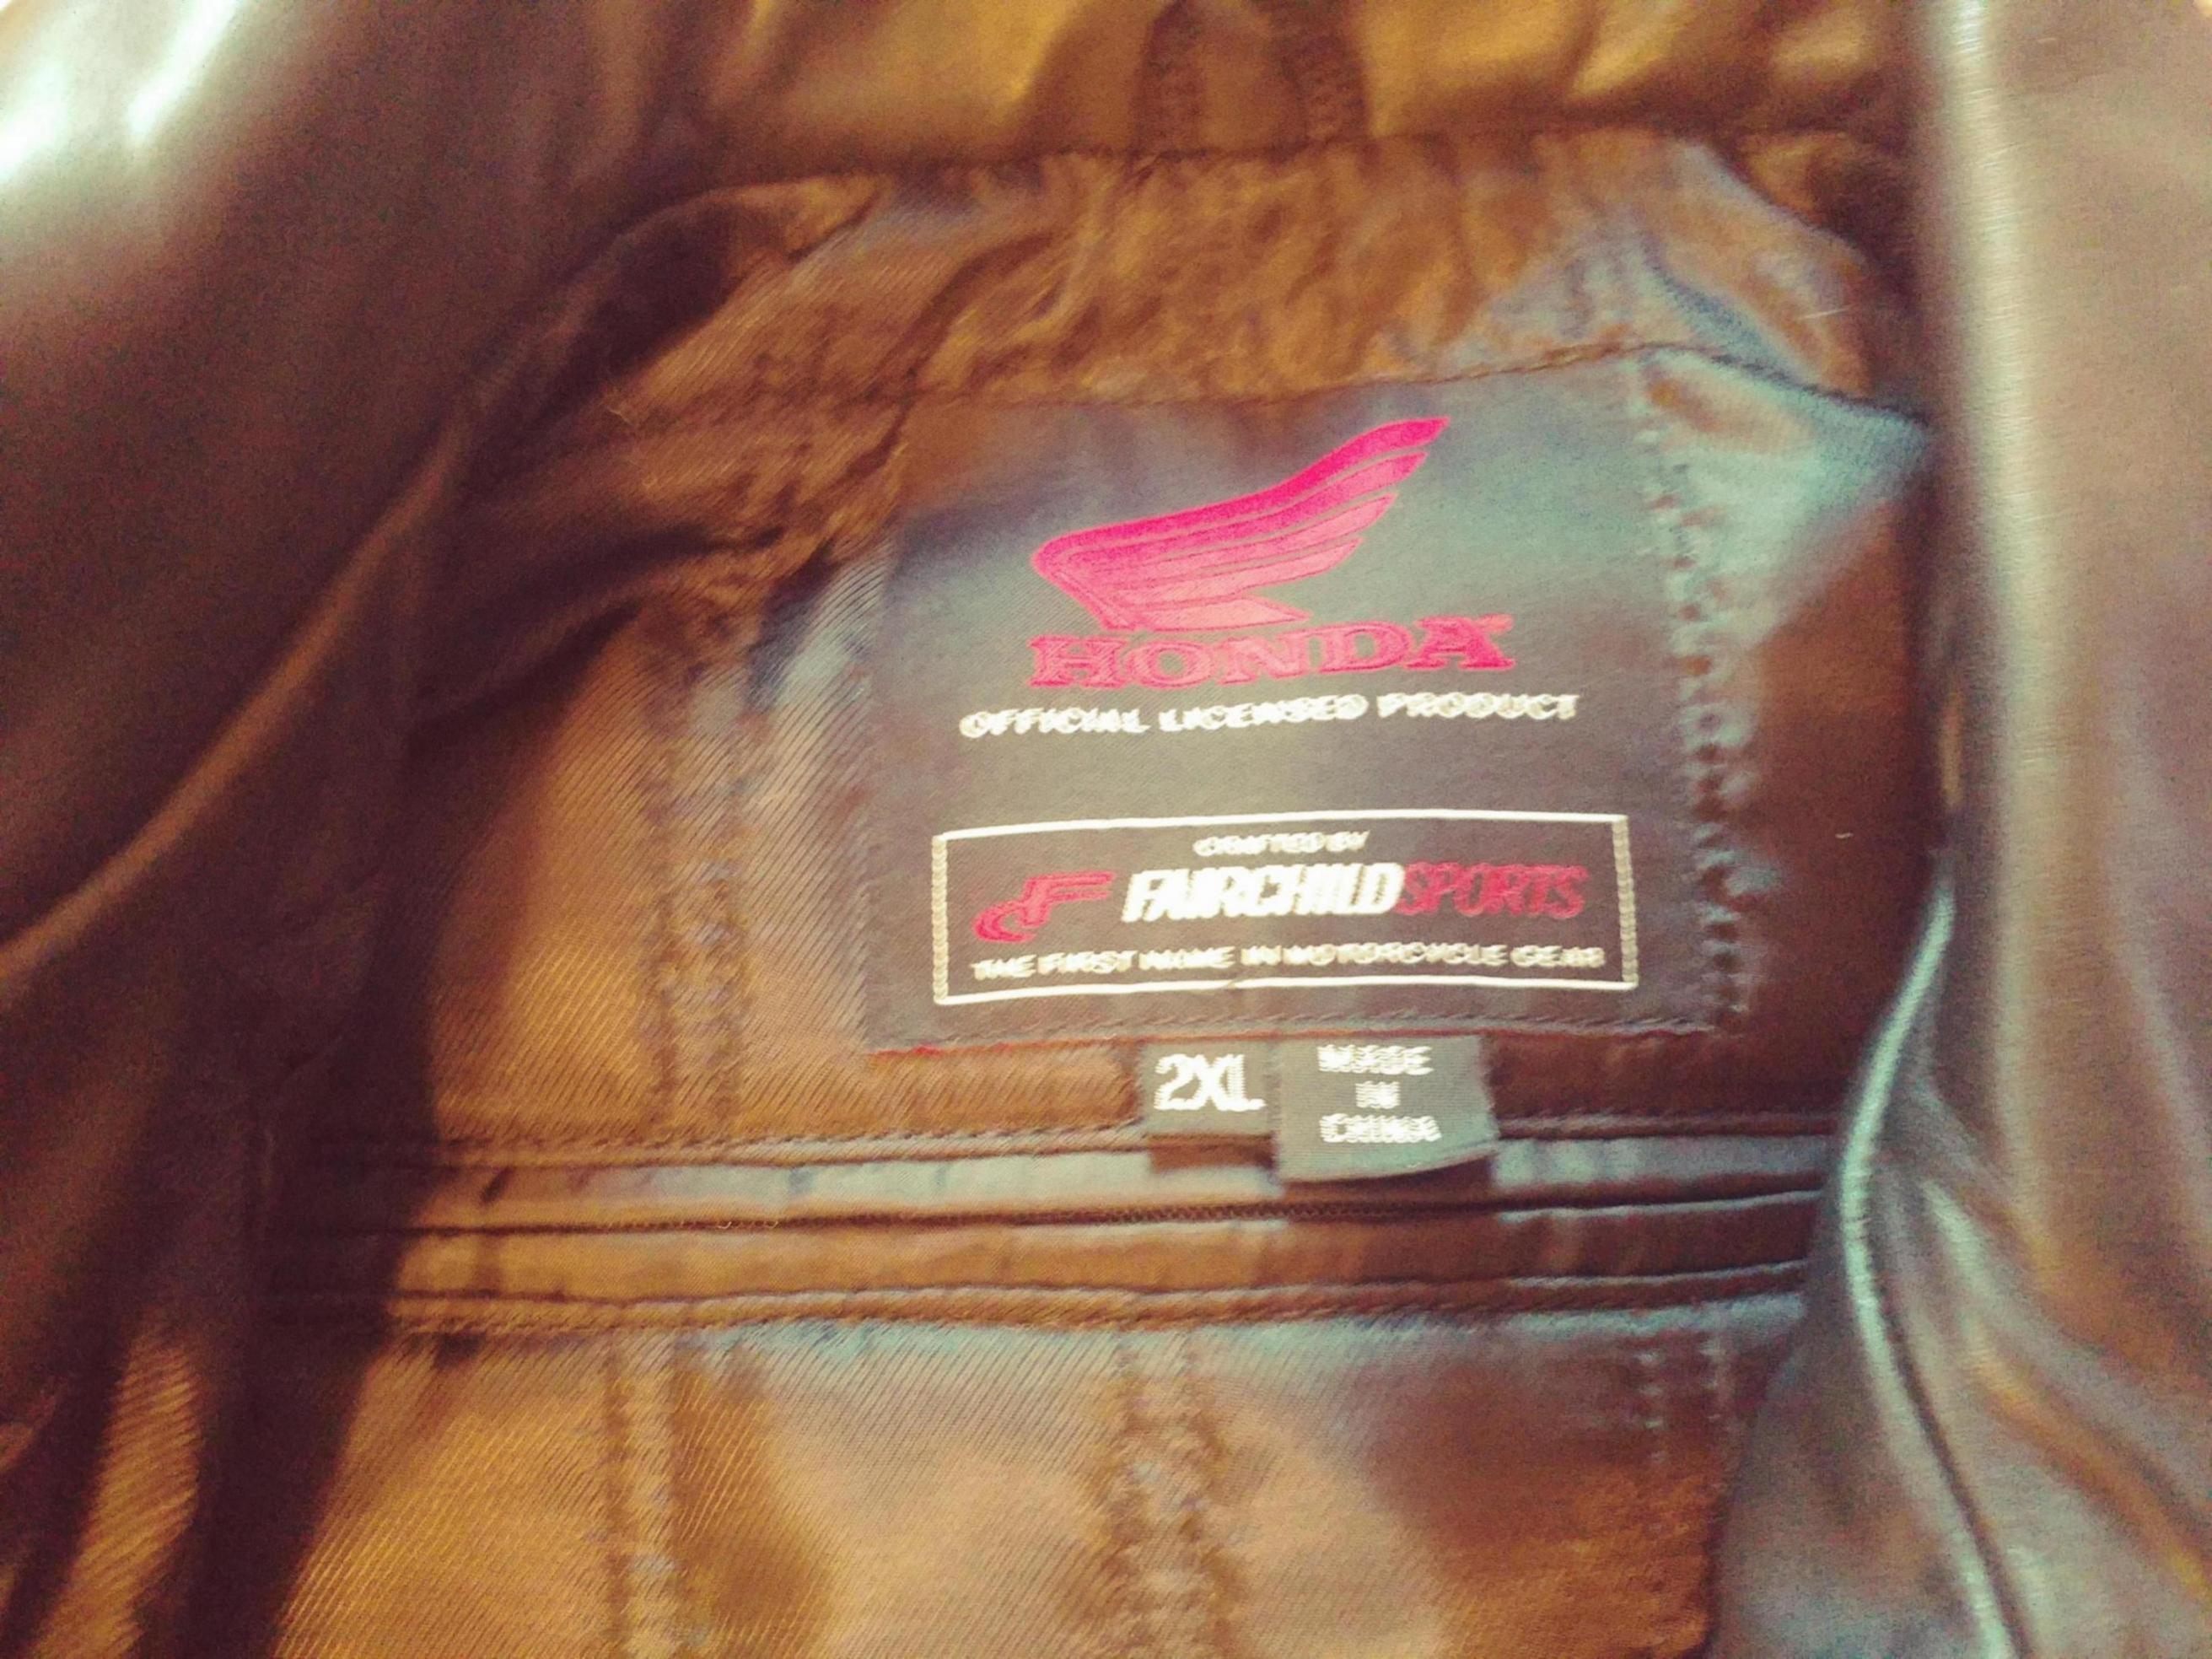 Jackets that won't break the bank?-0910191929a_1568345974761.jpg